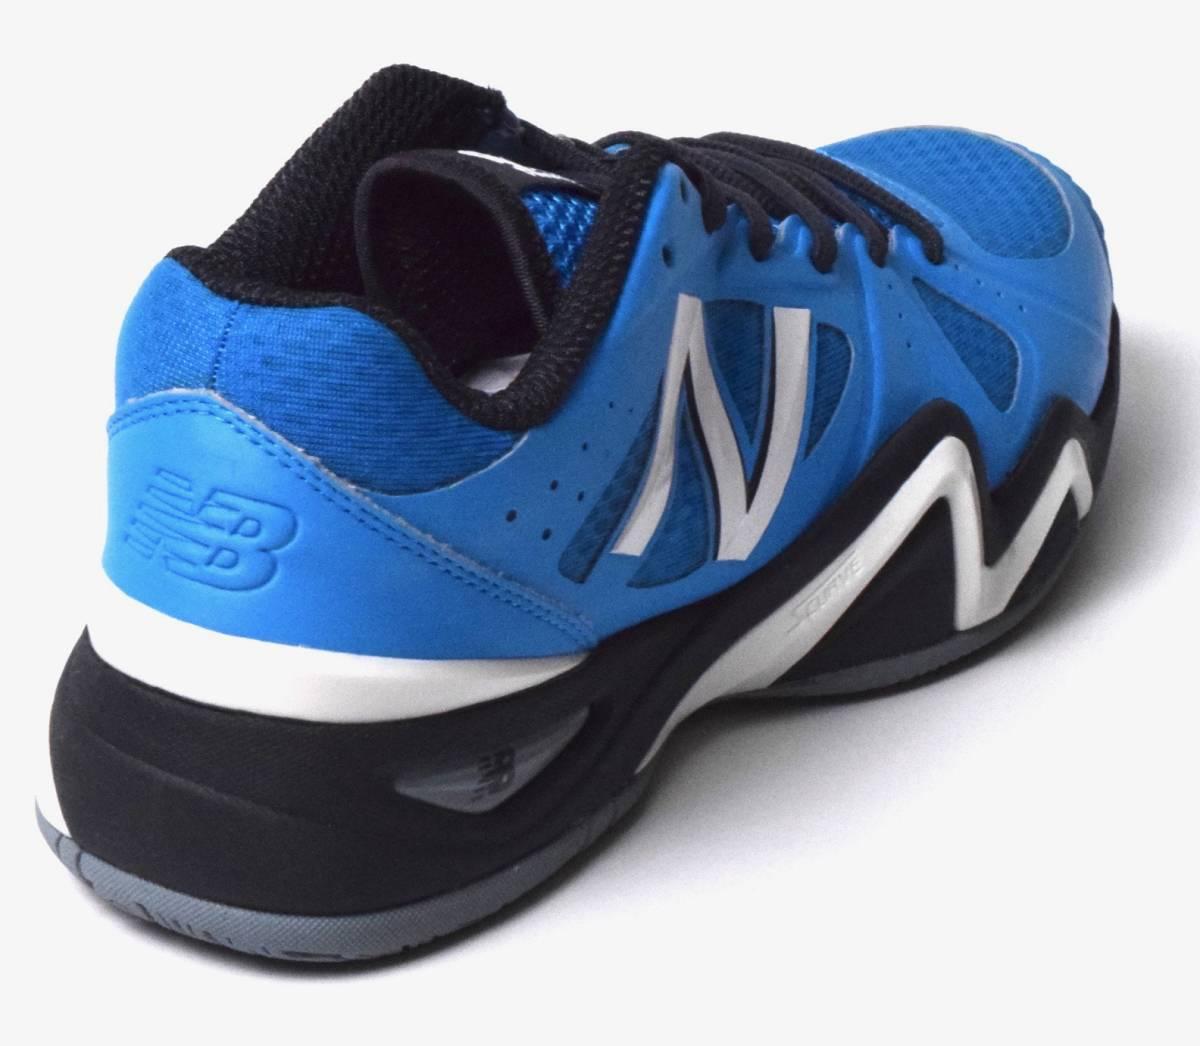 e869dc505988b 未使用NB ニューバランスMC1296BG オールコートテニスシューズ25.5 ブルー. 商品數量: :1